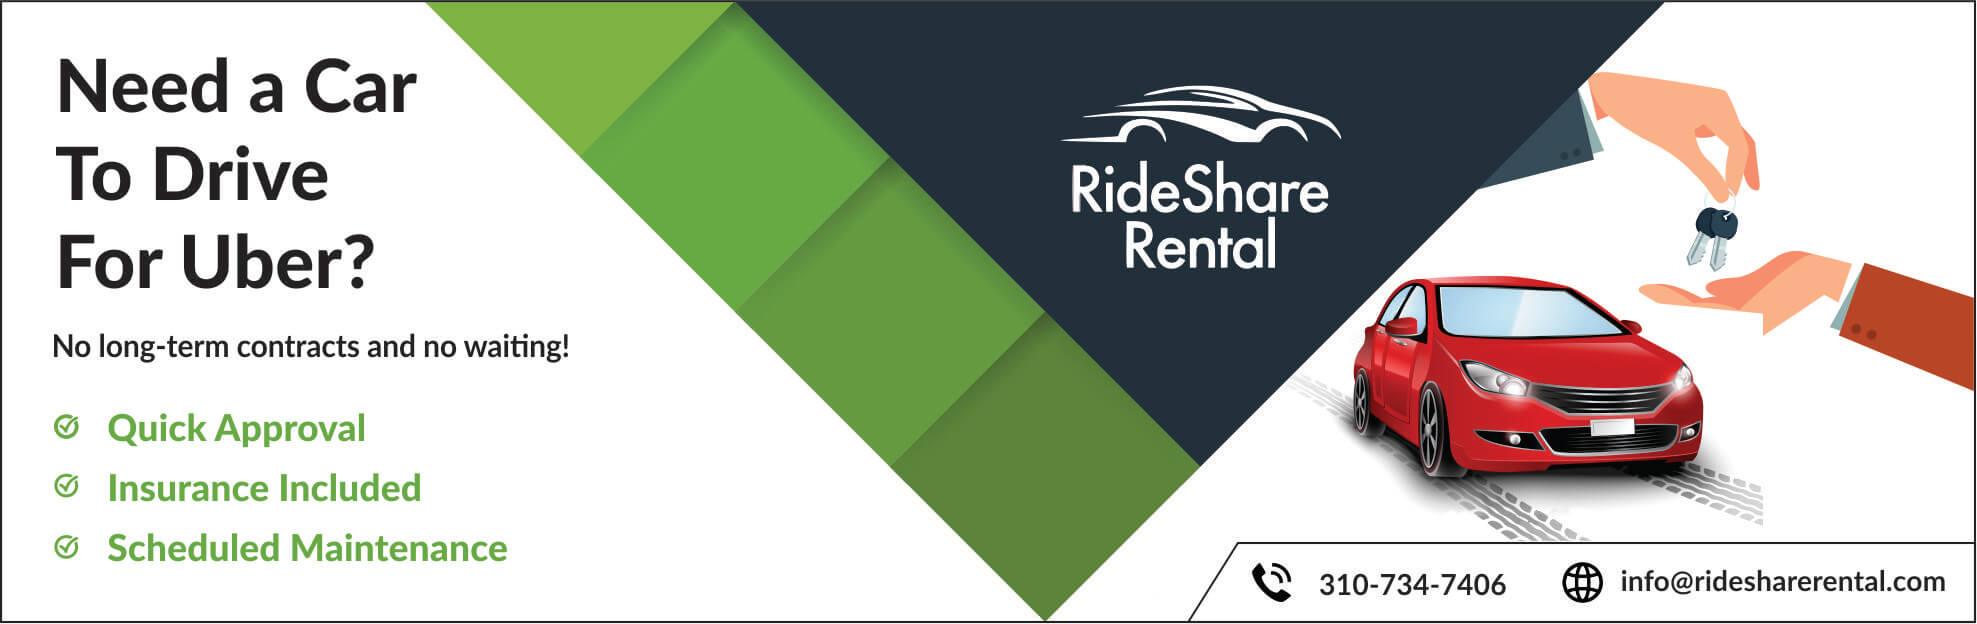 Uber Car Rental Service California